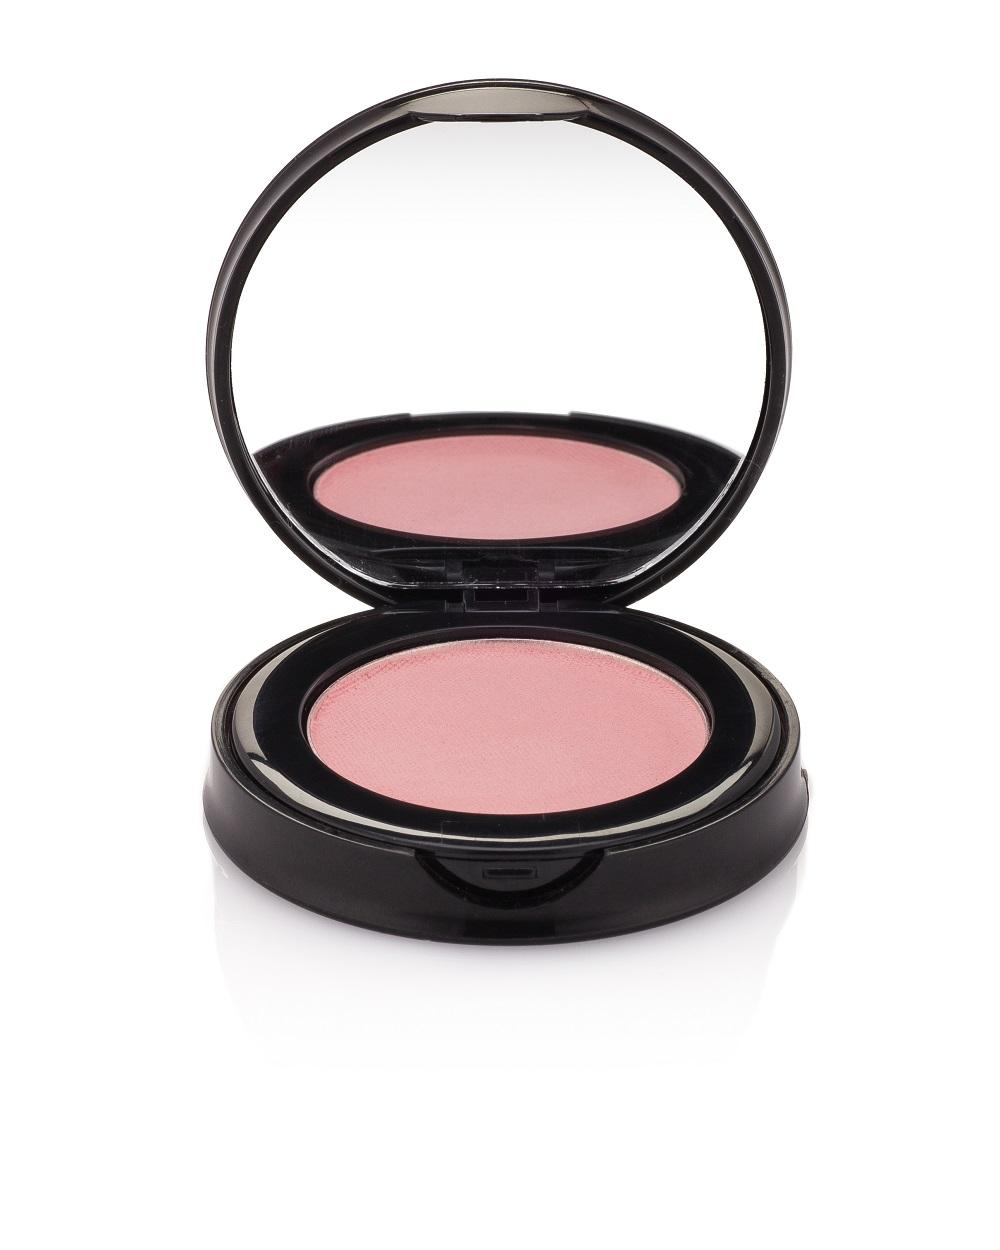 Multi Purpose Pressed Powders for Eyes & Face (Pink Parfait)